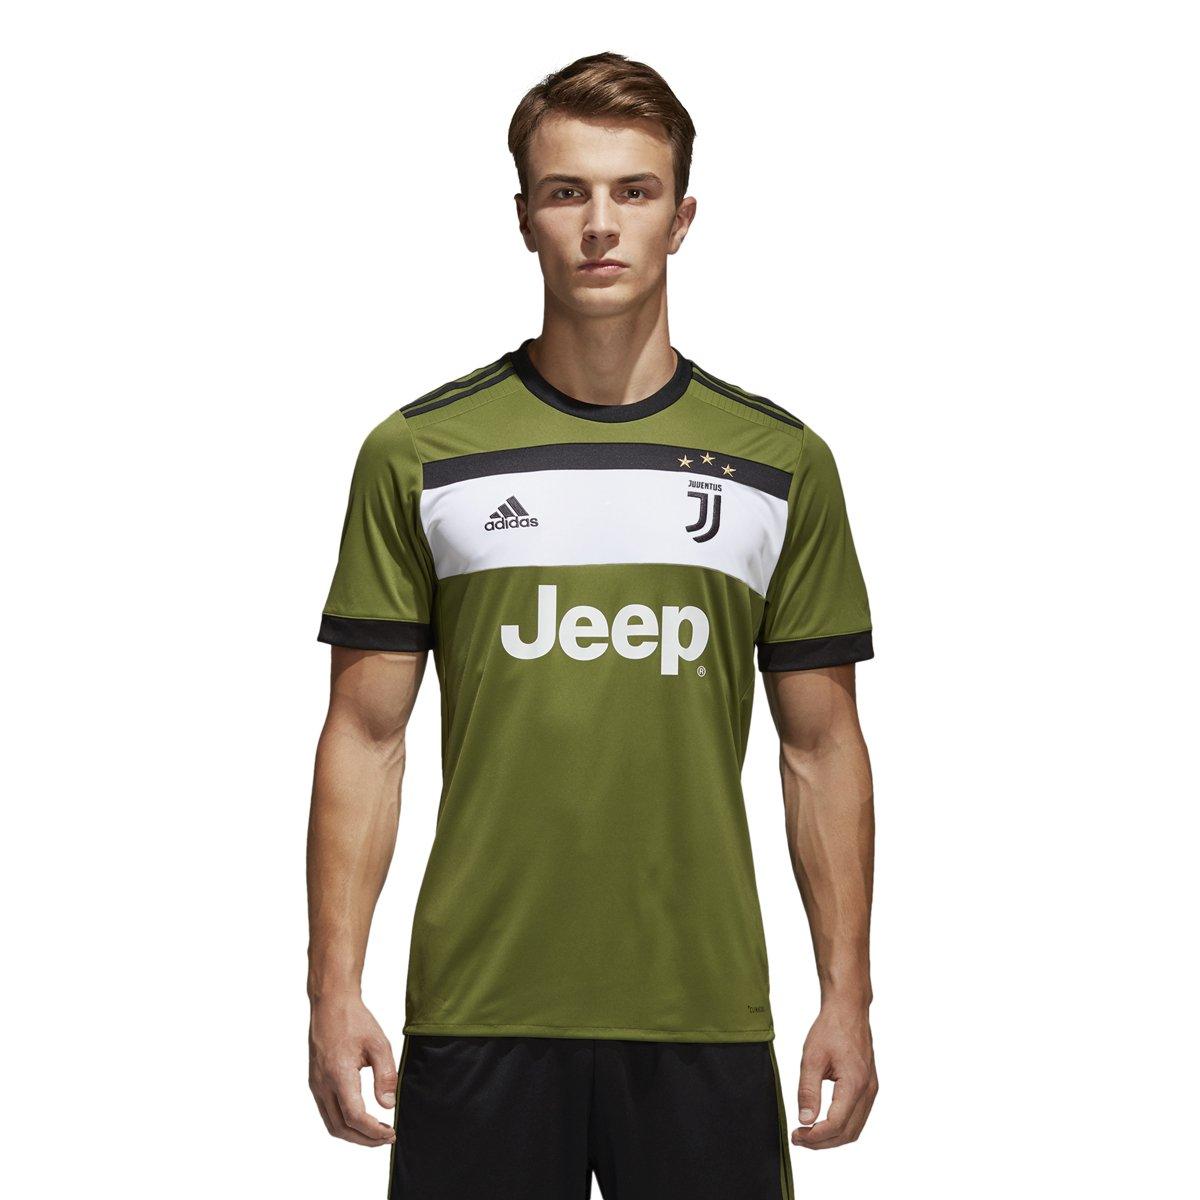 Amazon.com: adidas Juventus Third Soccer Stadium Jersey 2017-18 (2XL): Clothing